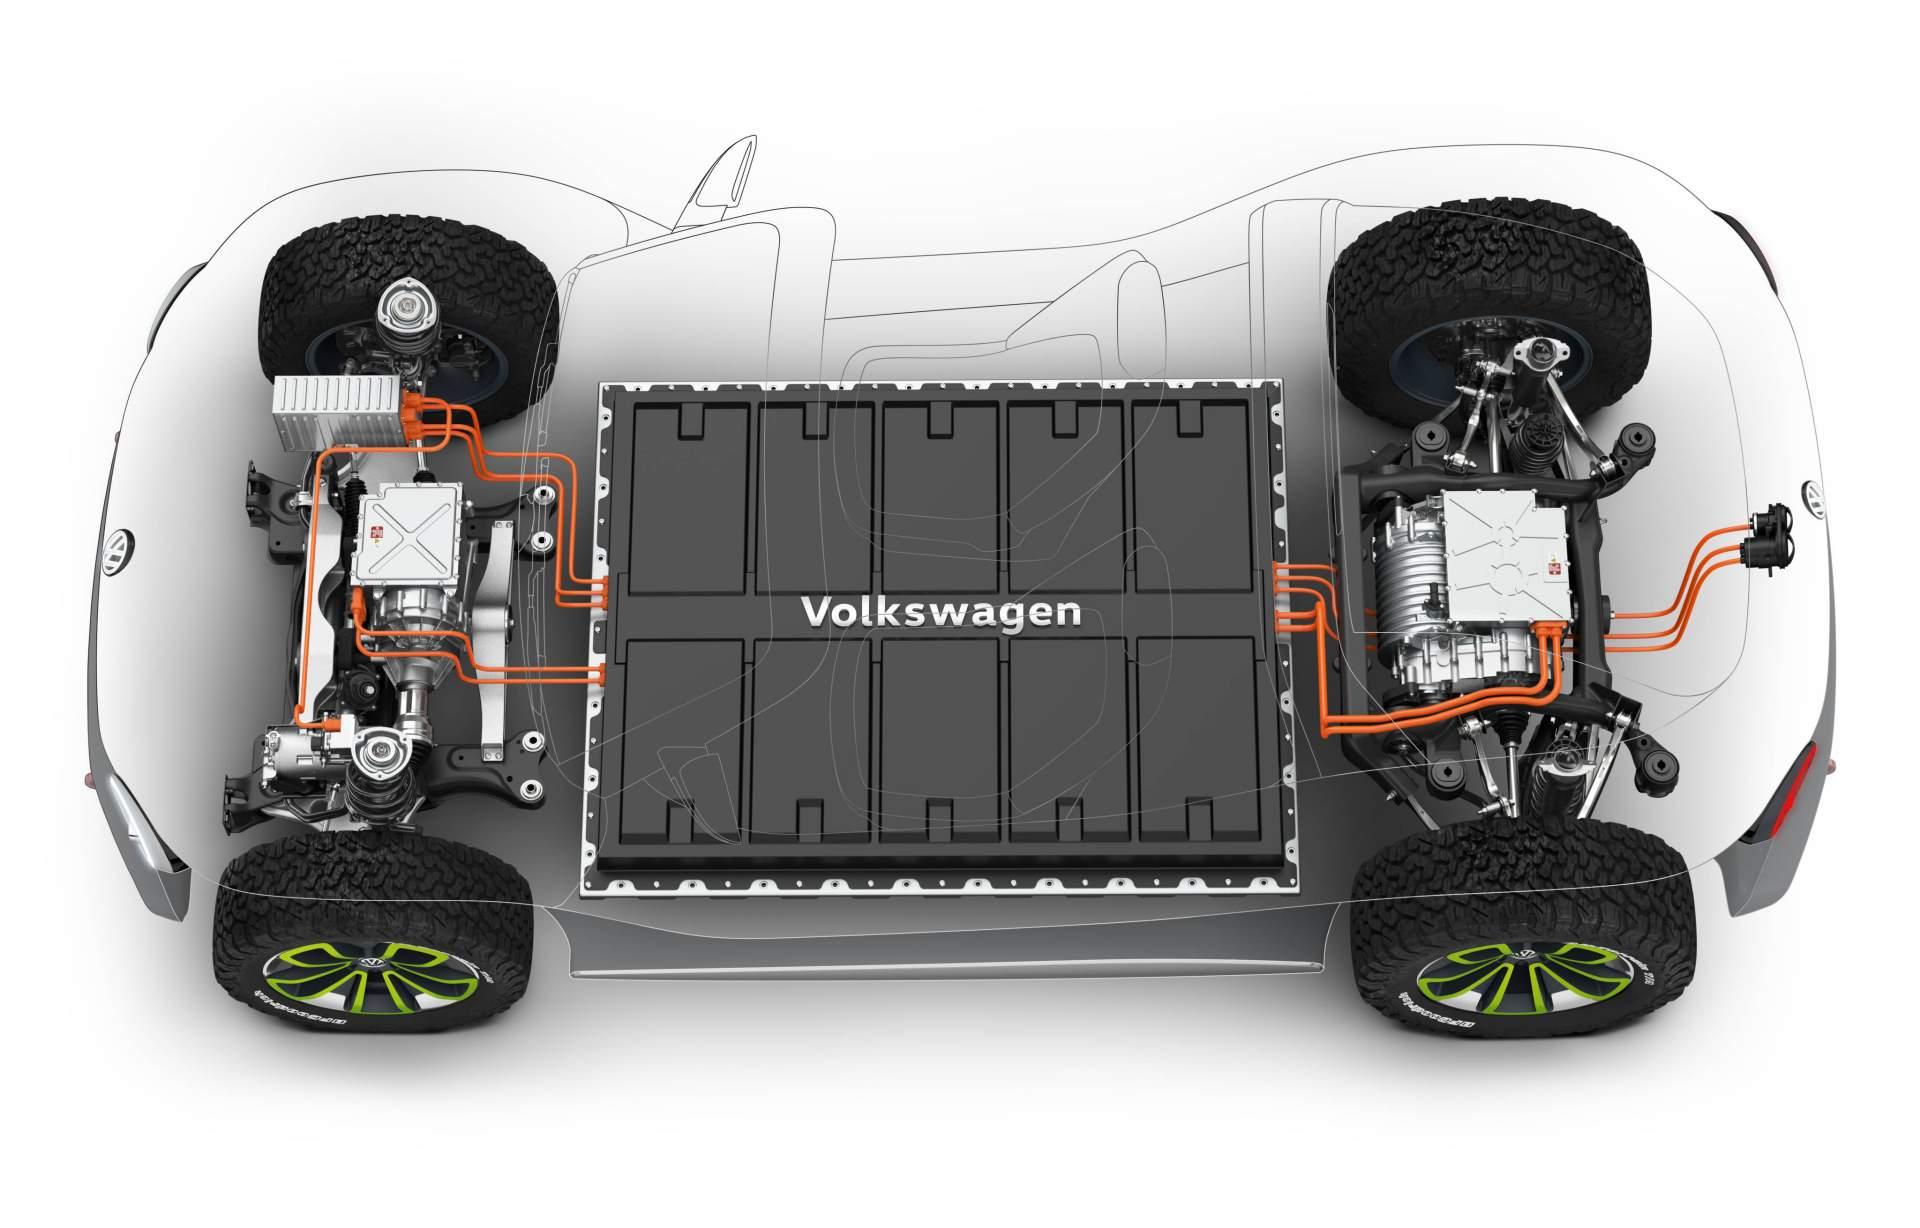 6dadd9a6-vw-meb-platform-3